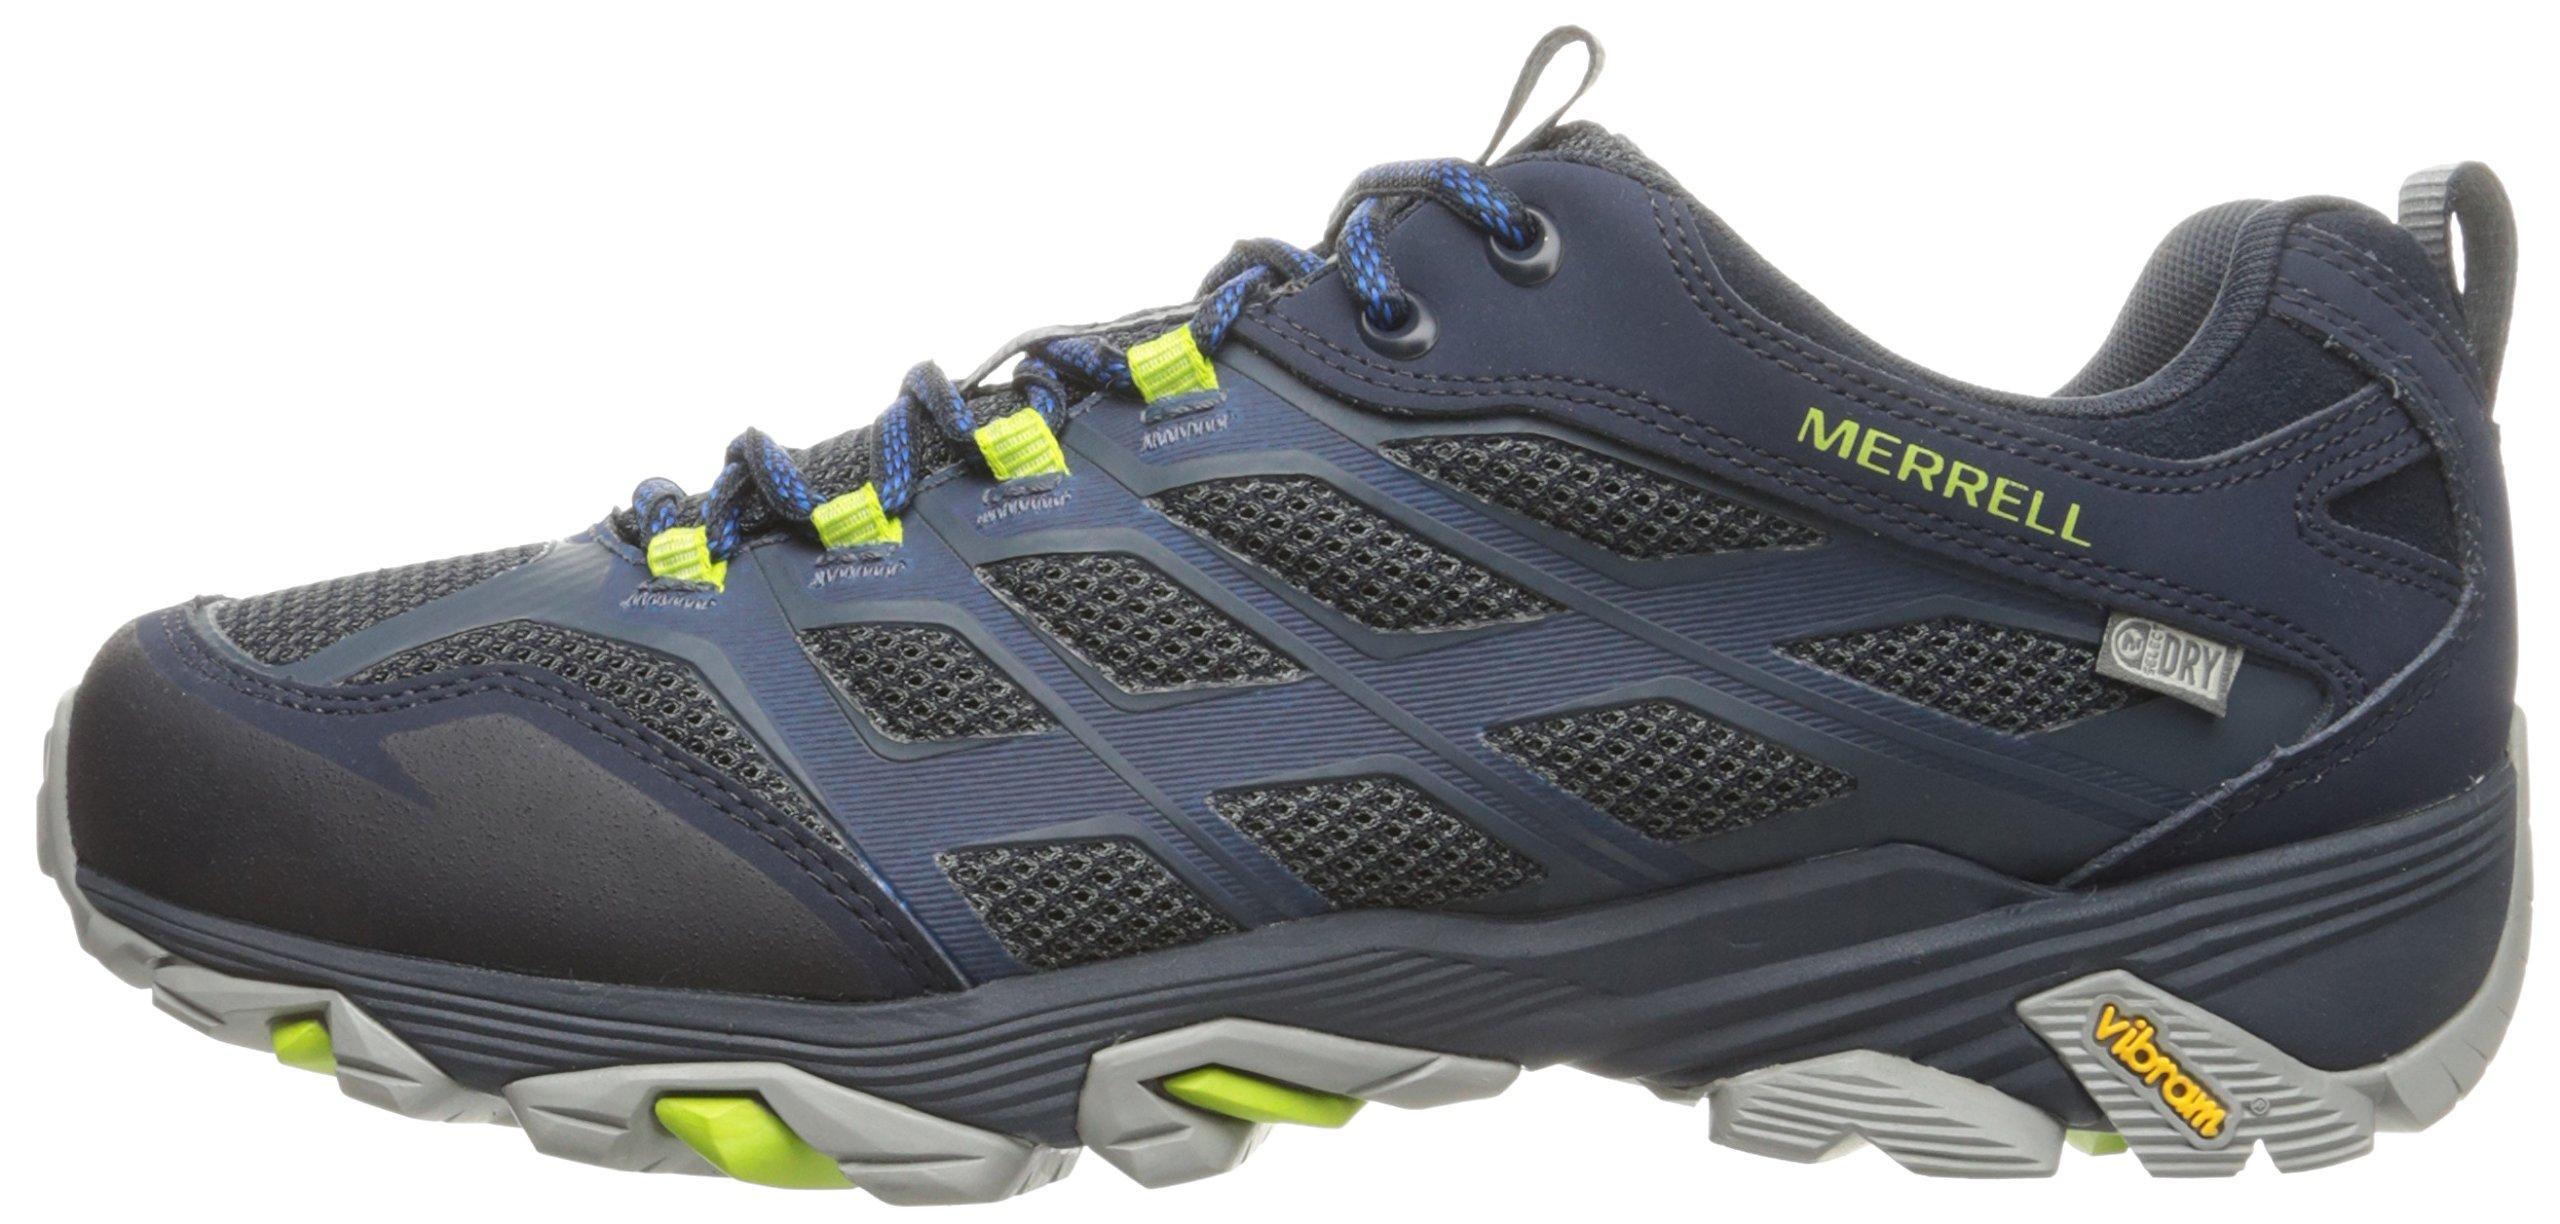 Merrell Men's Moab FST Waterproof Hiking Shoe, Navy, 8 M US by Merrell (Image #5)